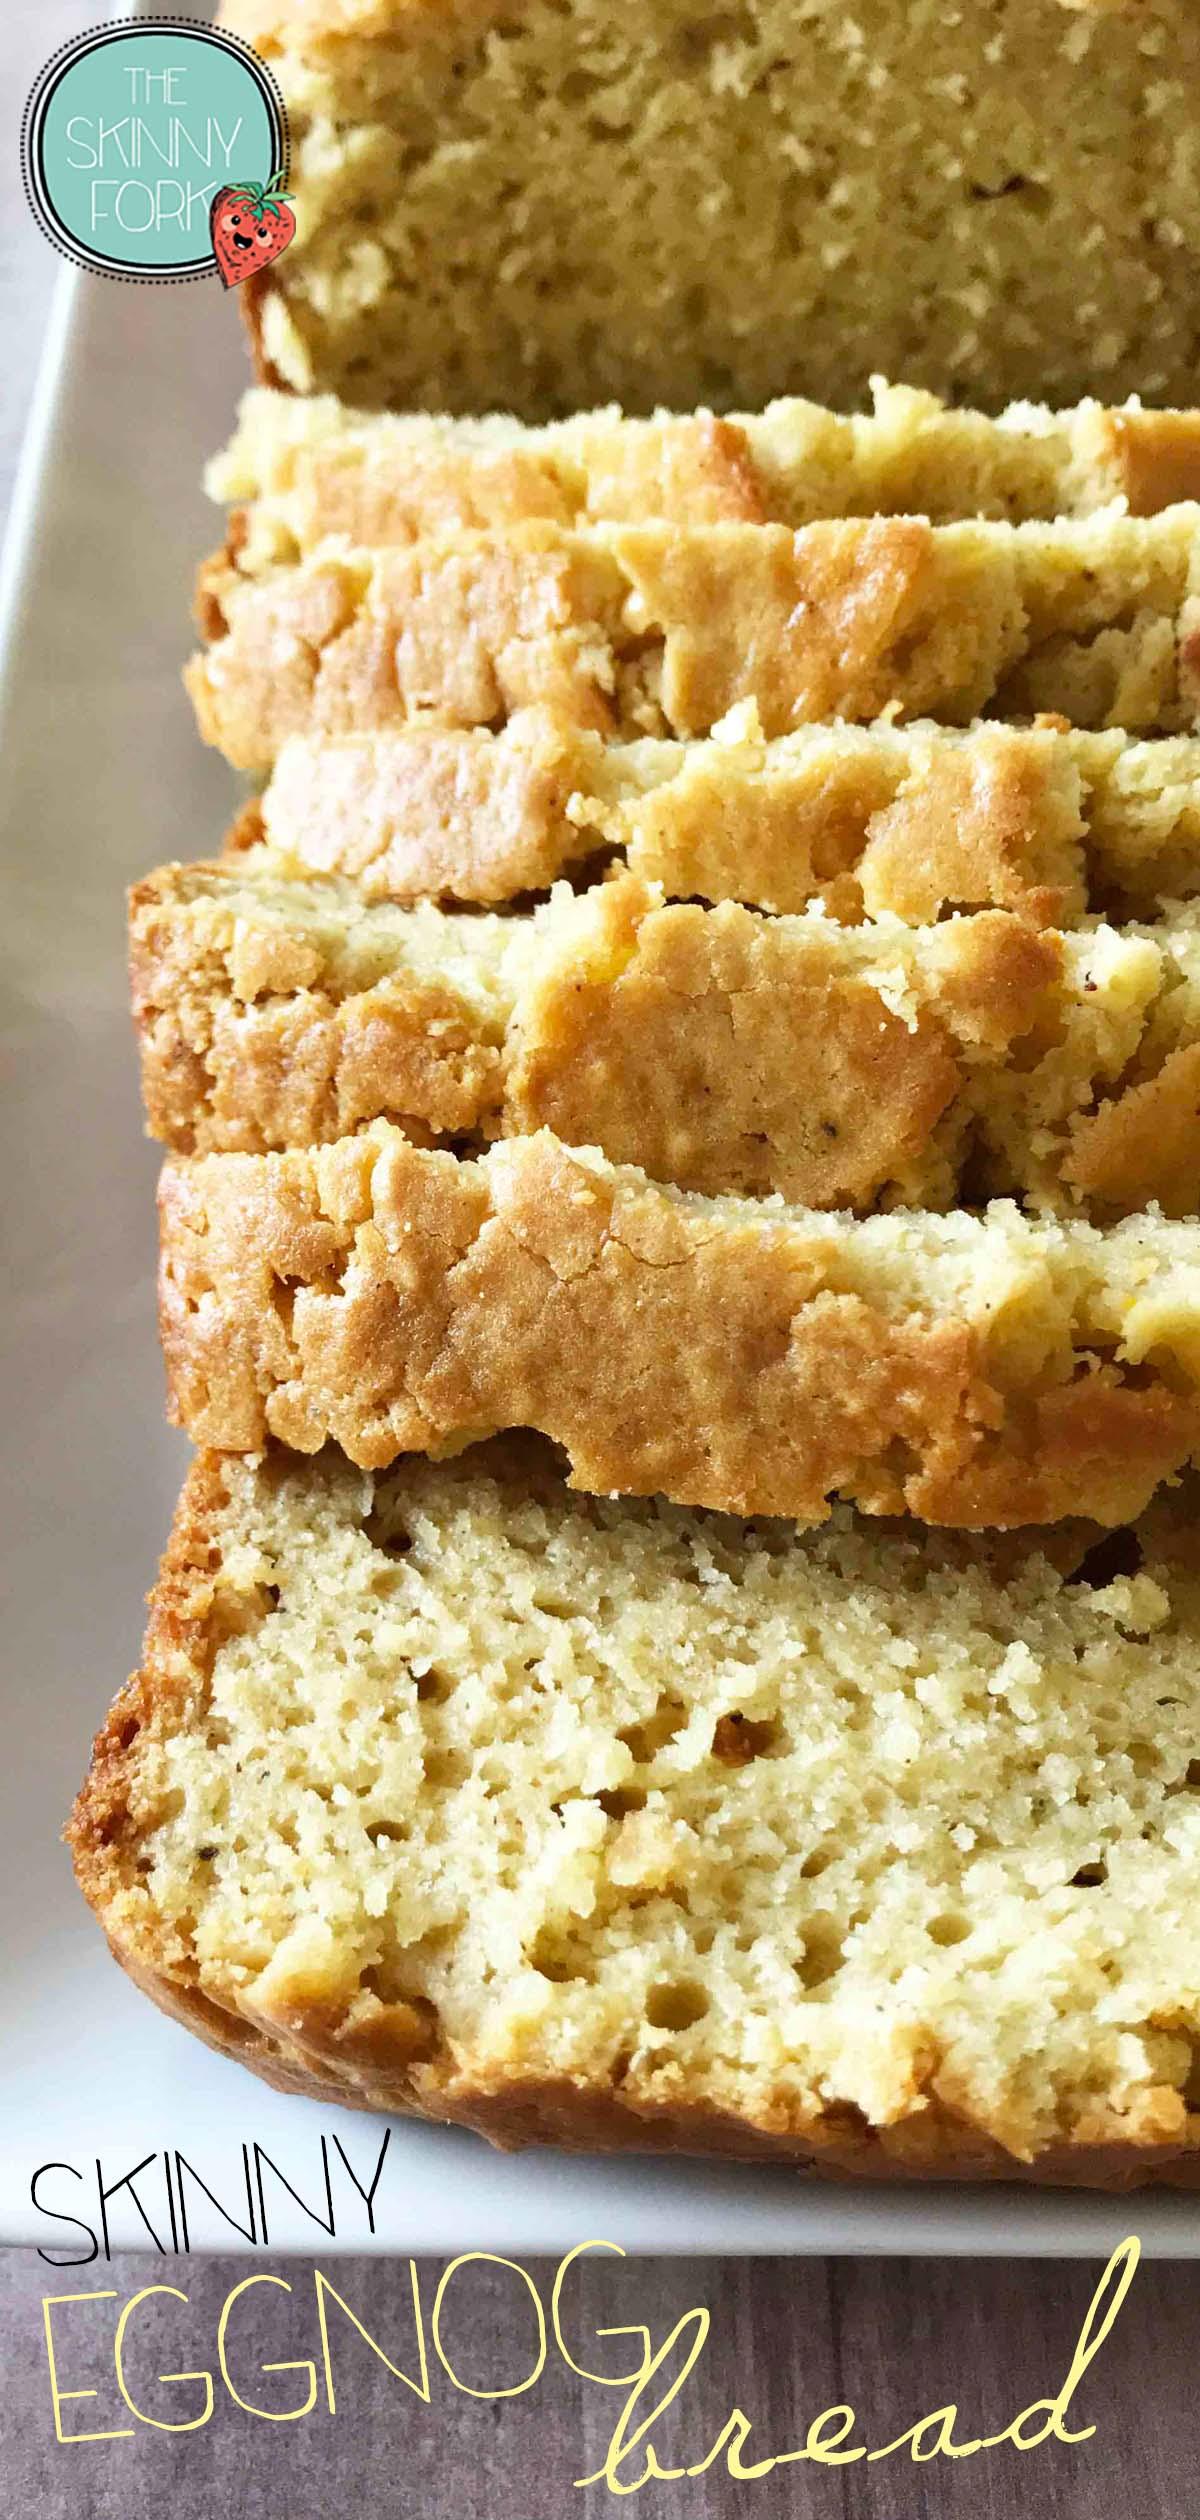 Skinny Eggnog Bread